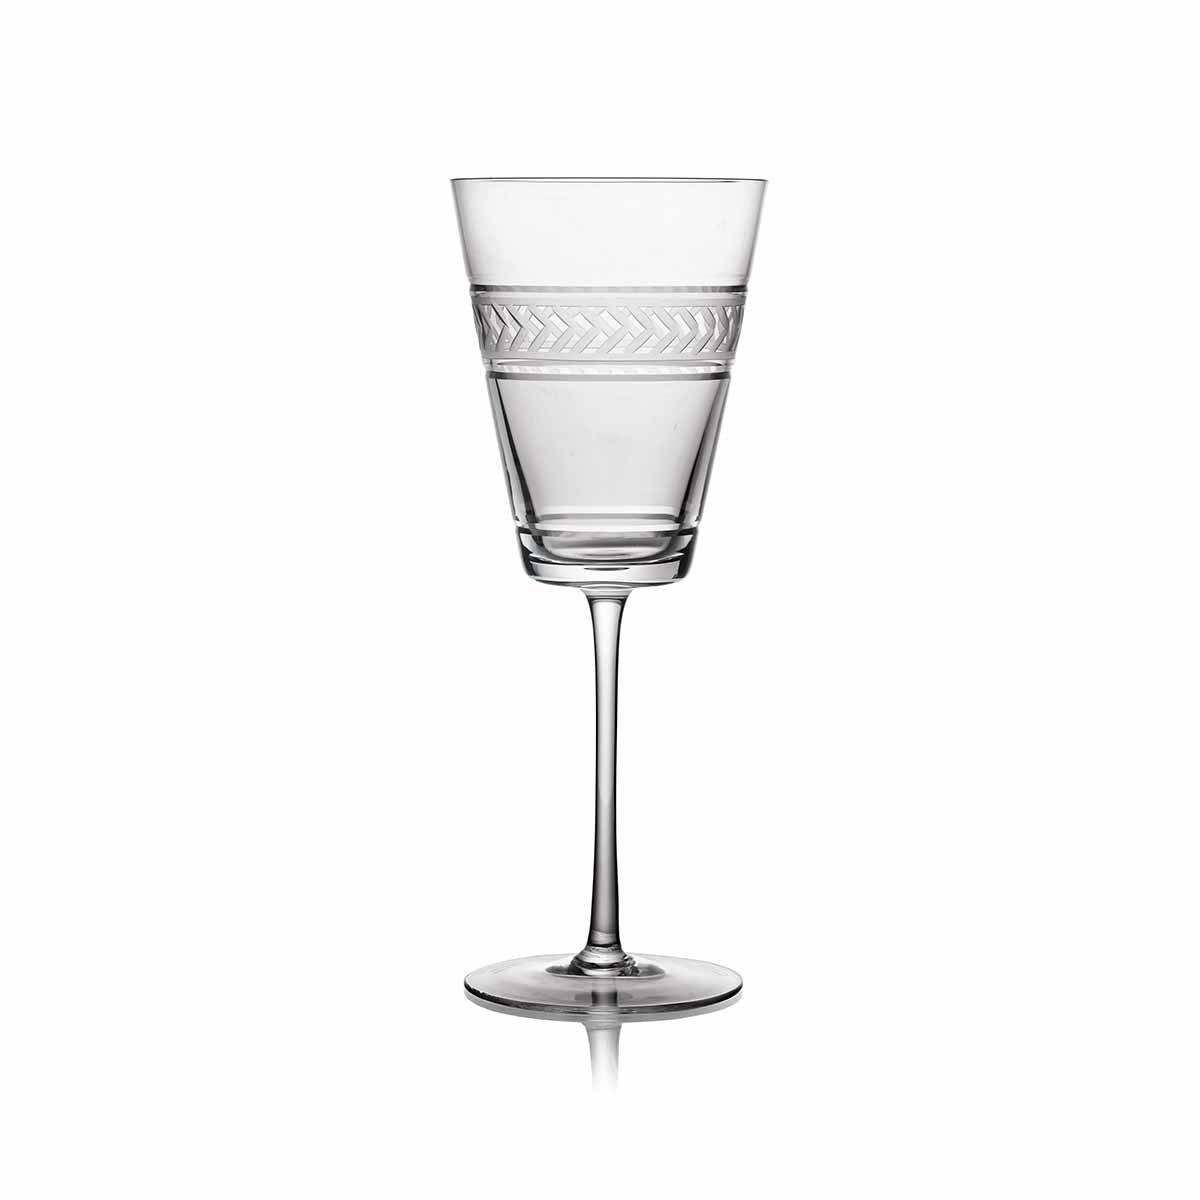 Michael Aram, Palace Water Glass, Pair